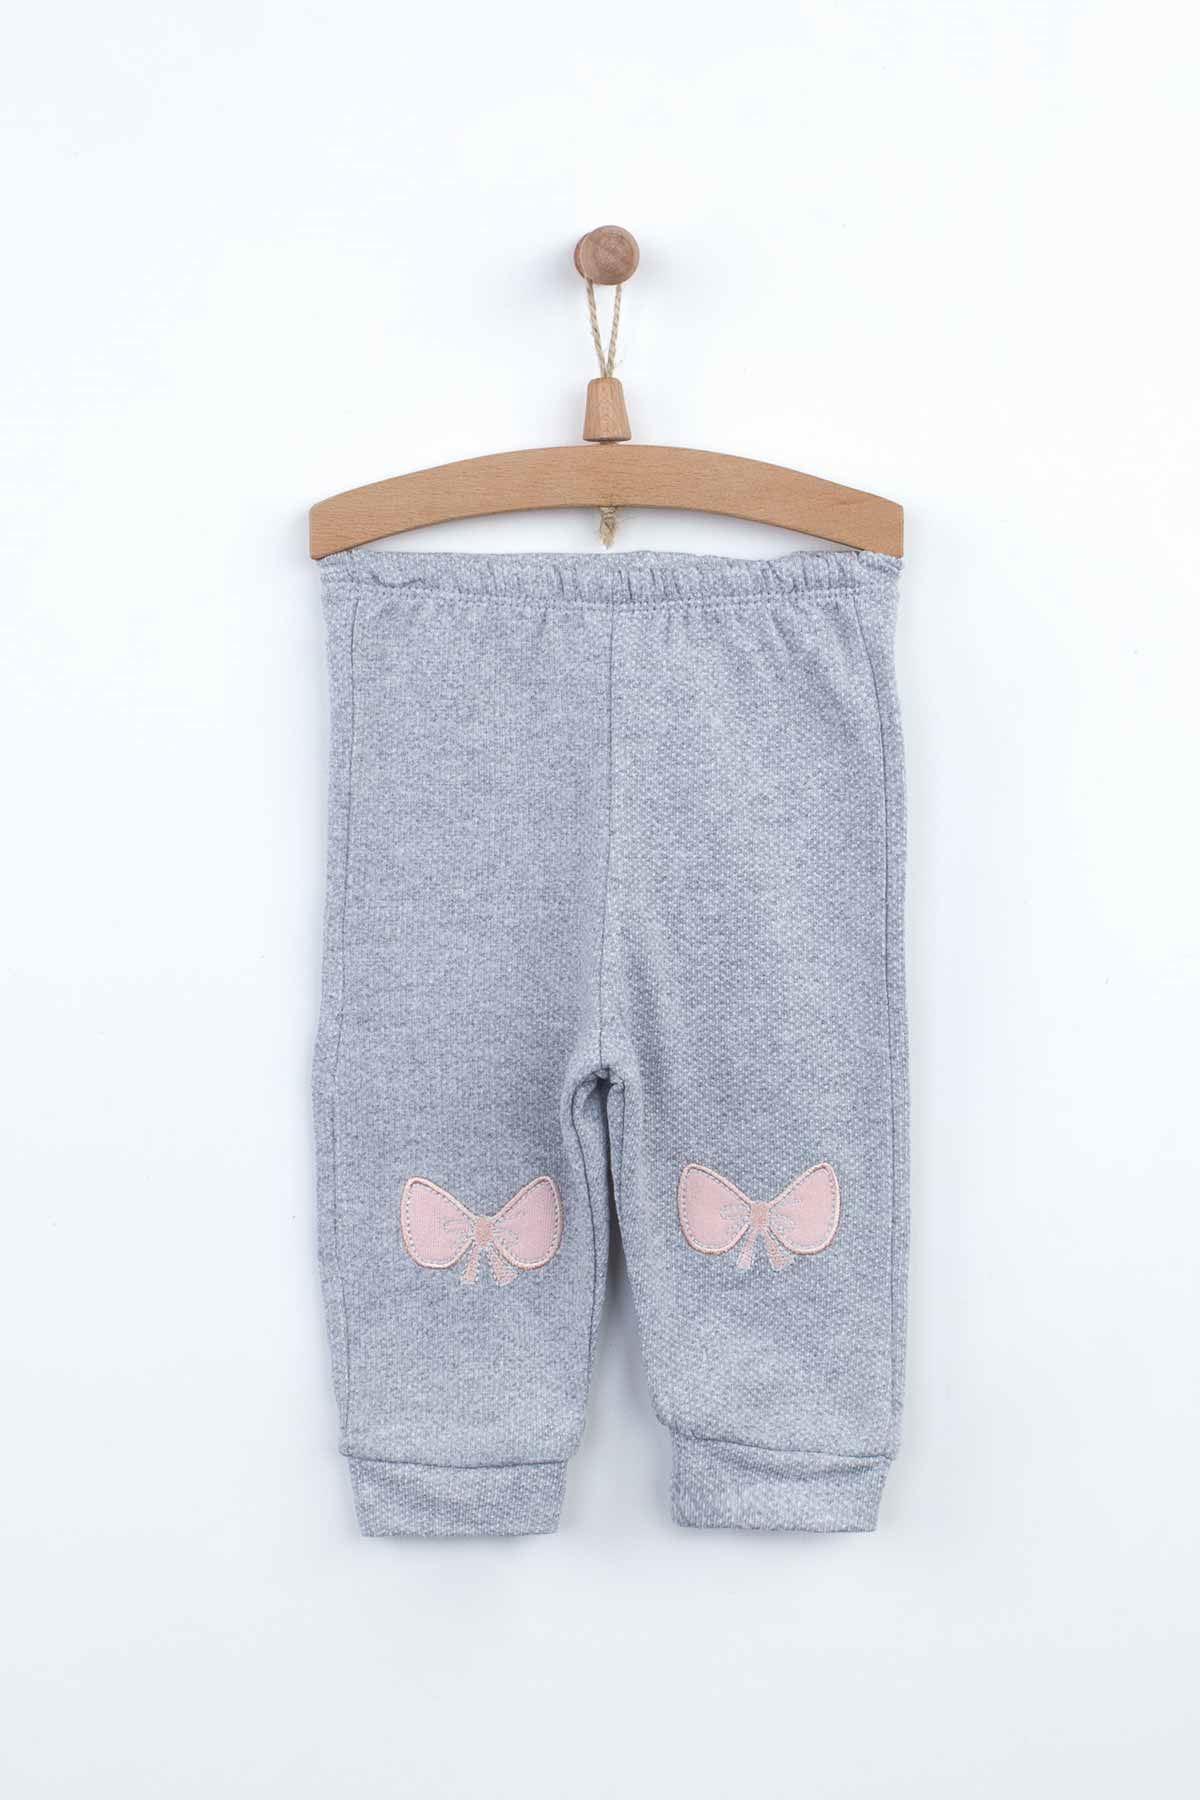 Powder Powder Baby Girl Tracksuit Sweatshirts Suit 2 Piece Set Cute Babies Pajamas Cotton Casual Wear Outfit Girls Babies Models